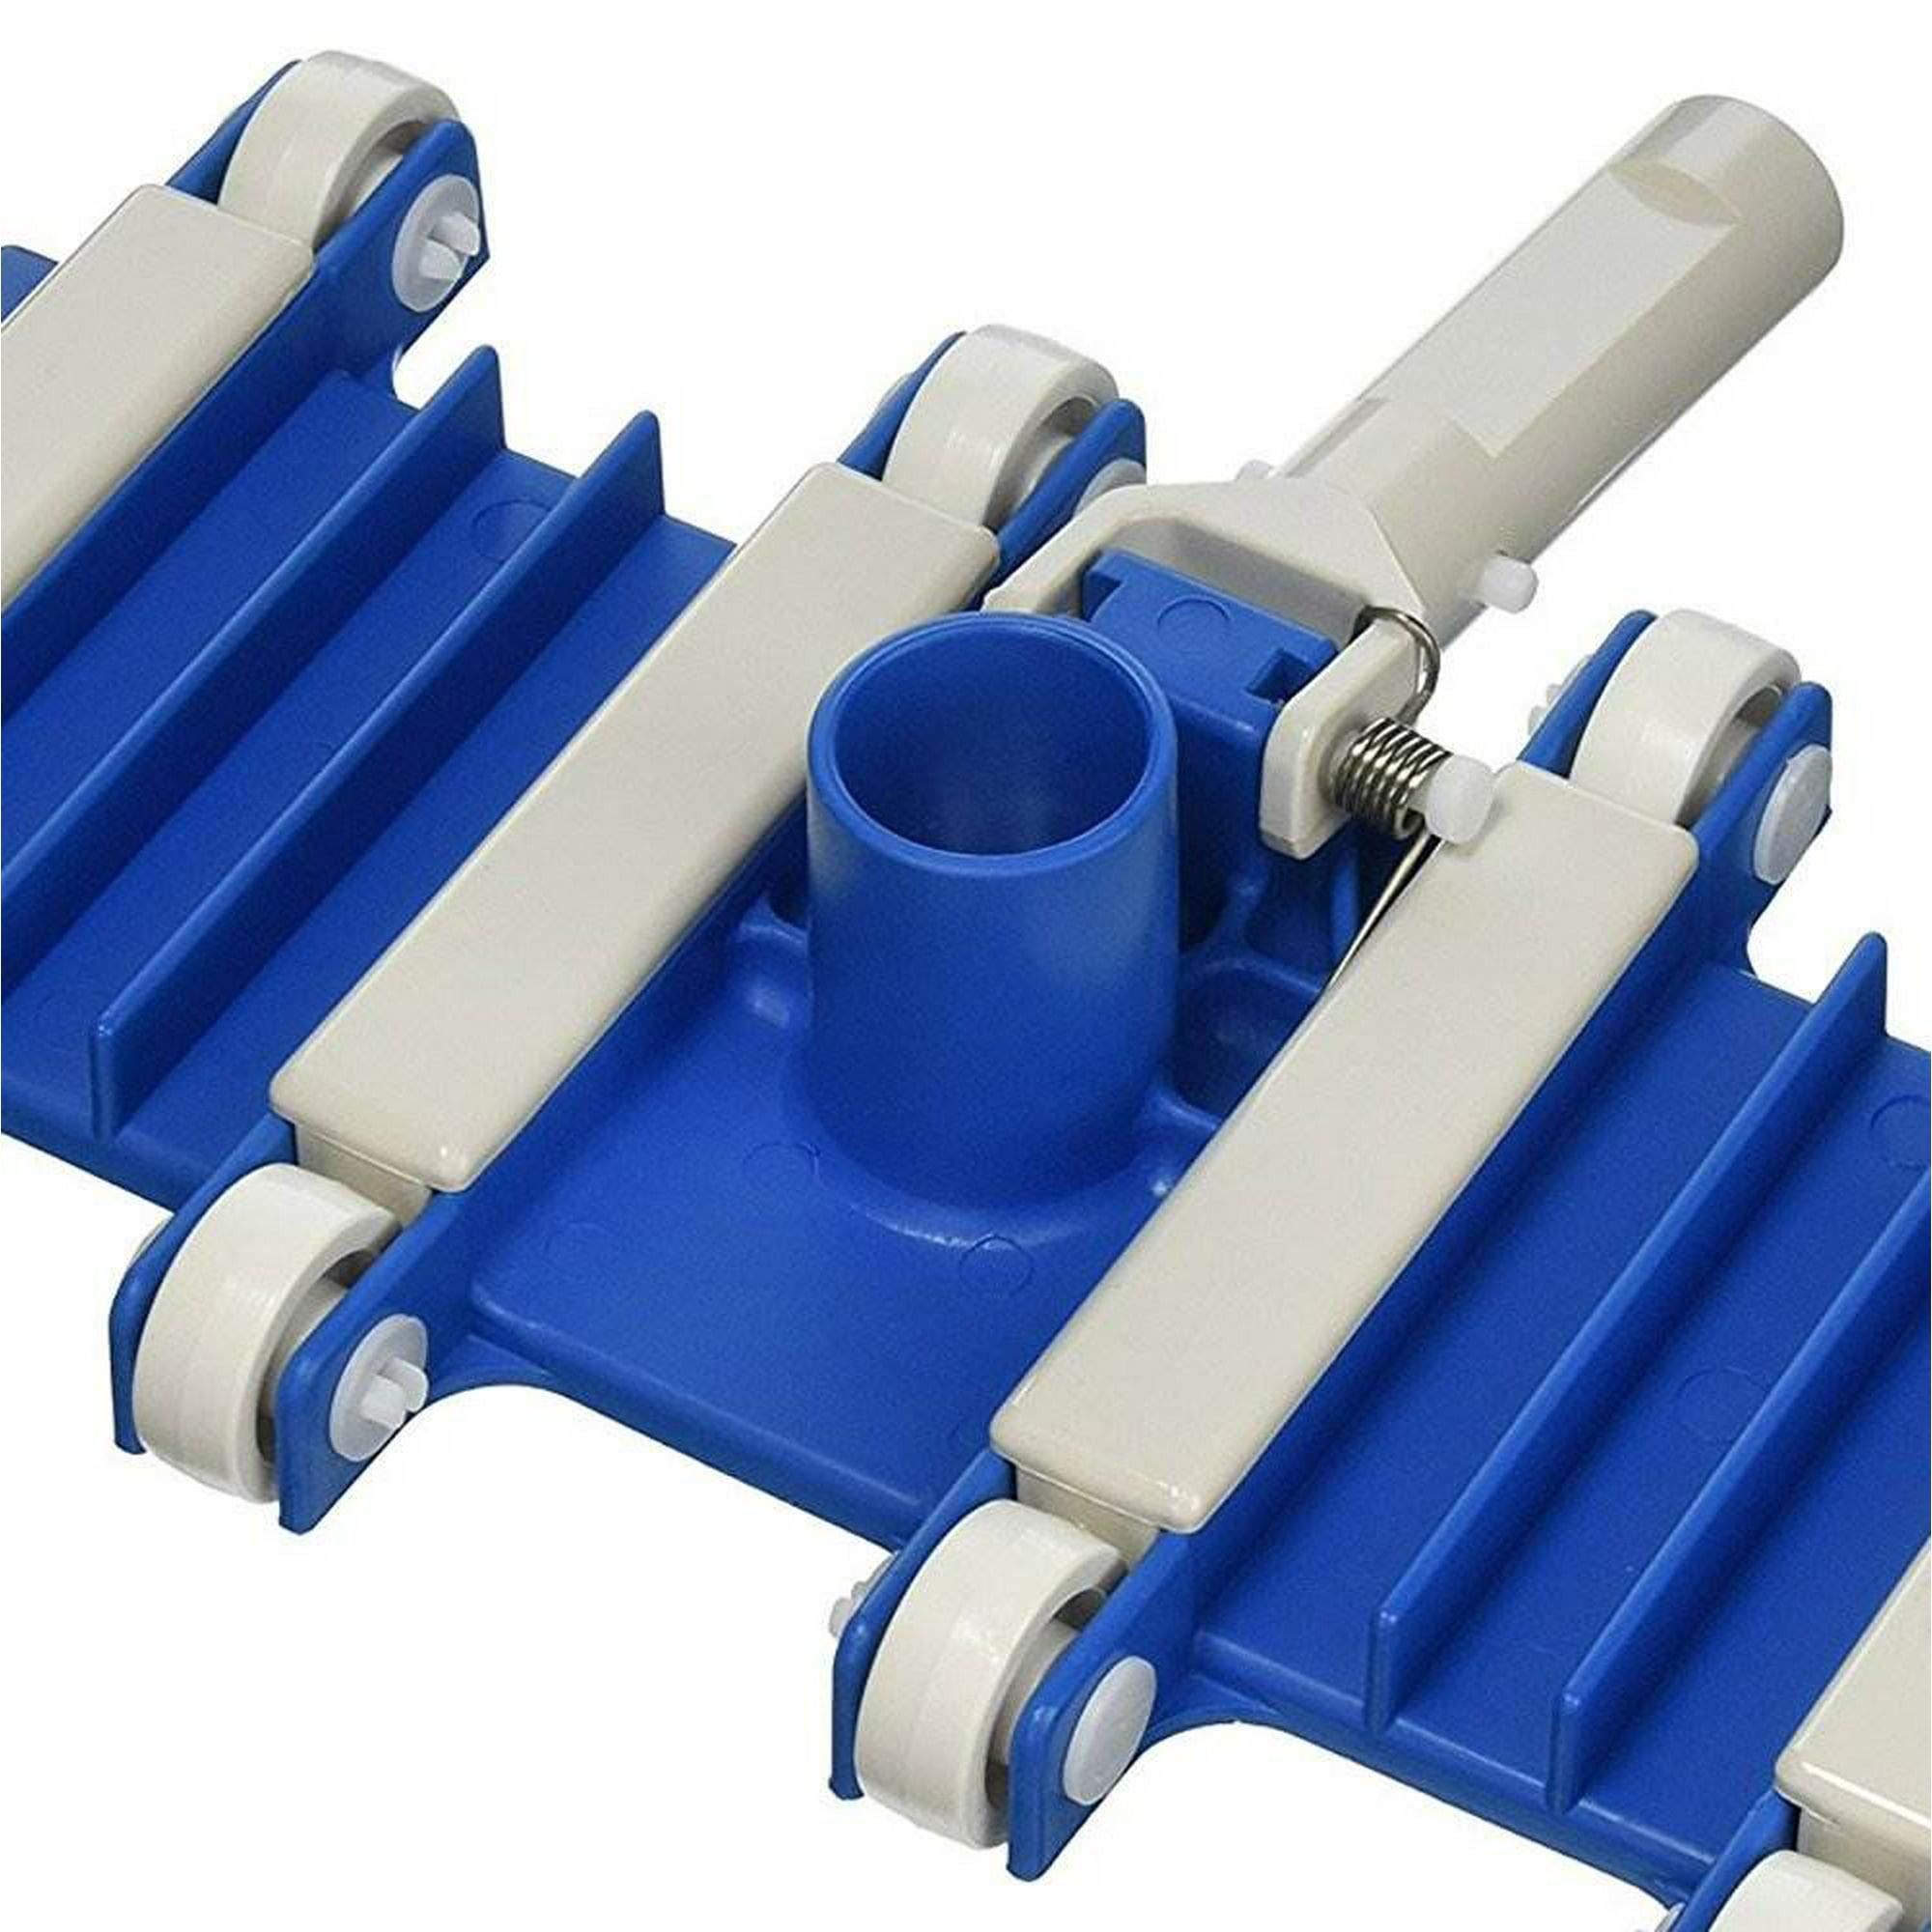 Pentair R201388 203 Superflex Flexible 14 Inch Swimming Pool Vacuum Cleaner  Head